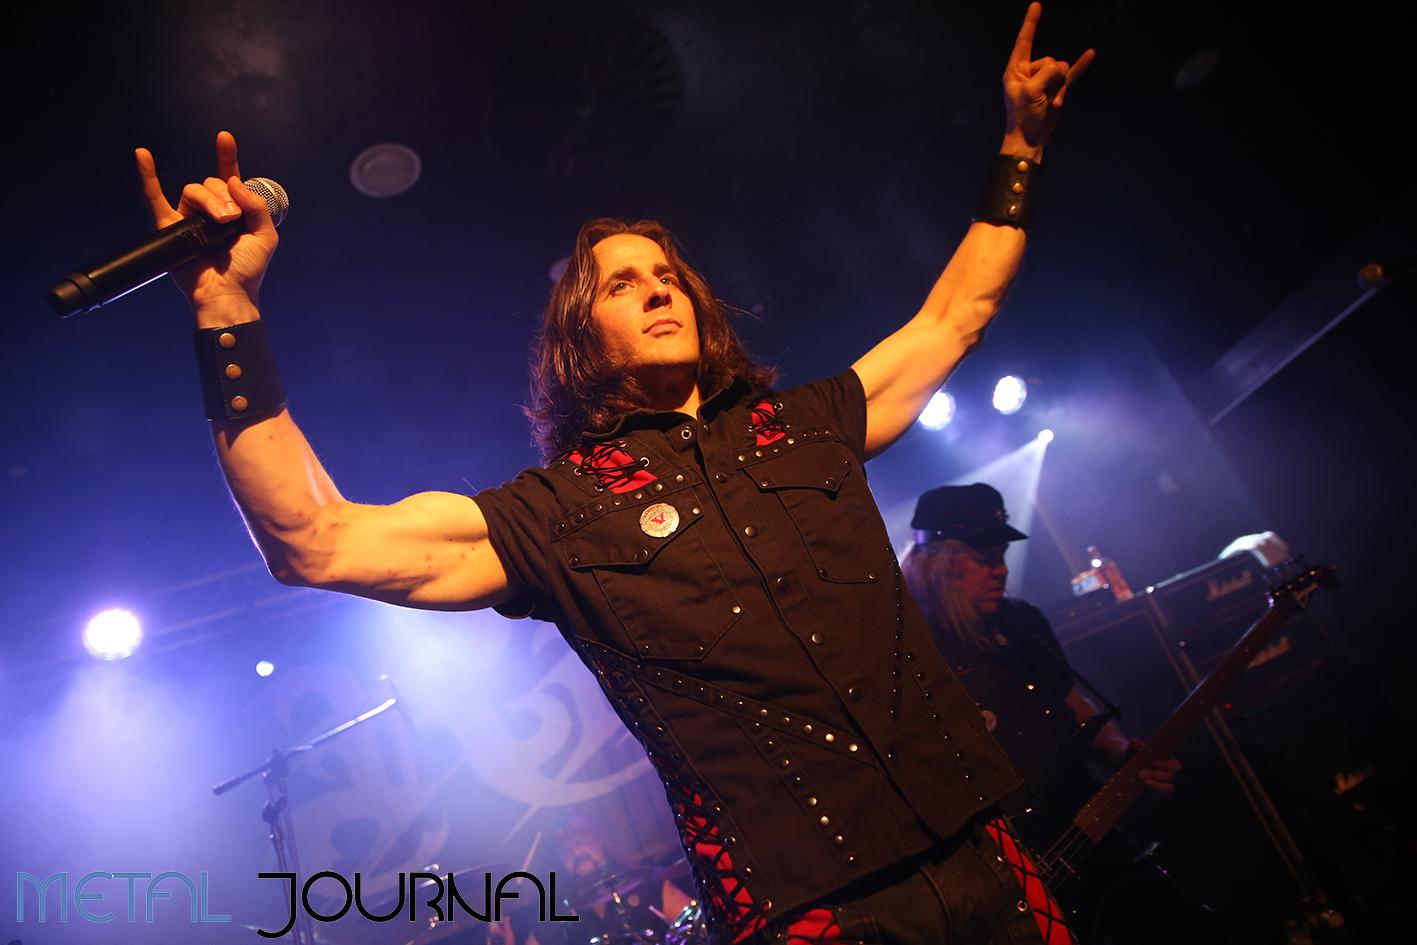 riot v - metal journal 2019 pic 8